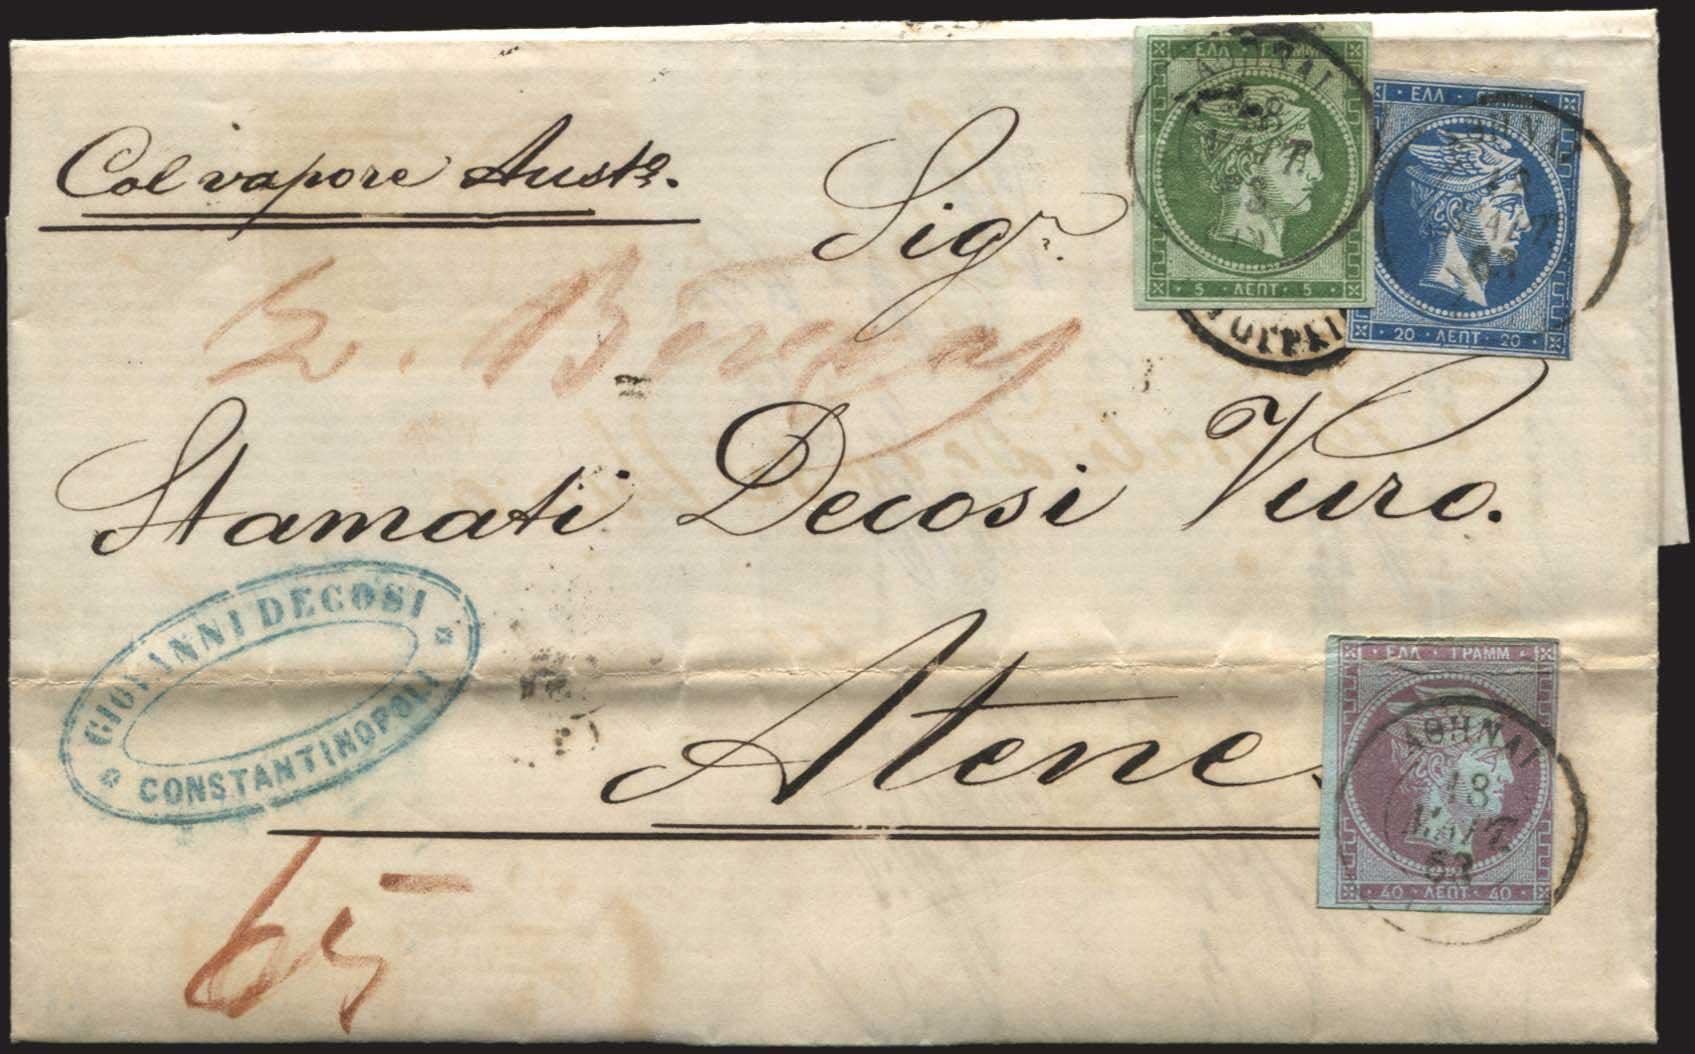 Lot 112 - -  LARGE HERMES HEAD 1862/67 consecutive athens printings -  A. Karamitsos Postal & Live Internet Auction 678 General Philatelic Auction